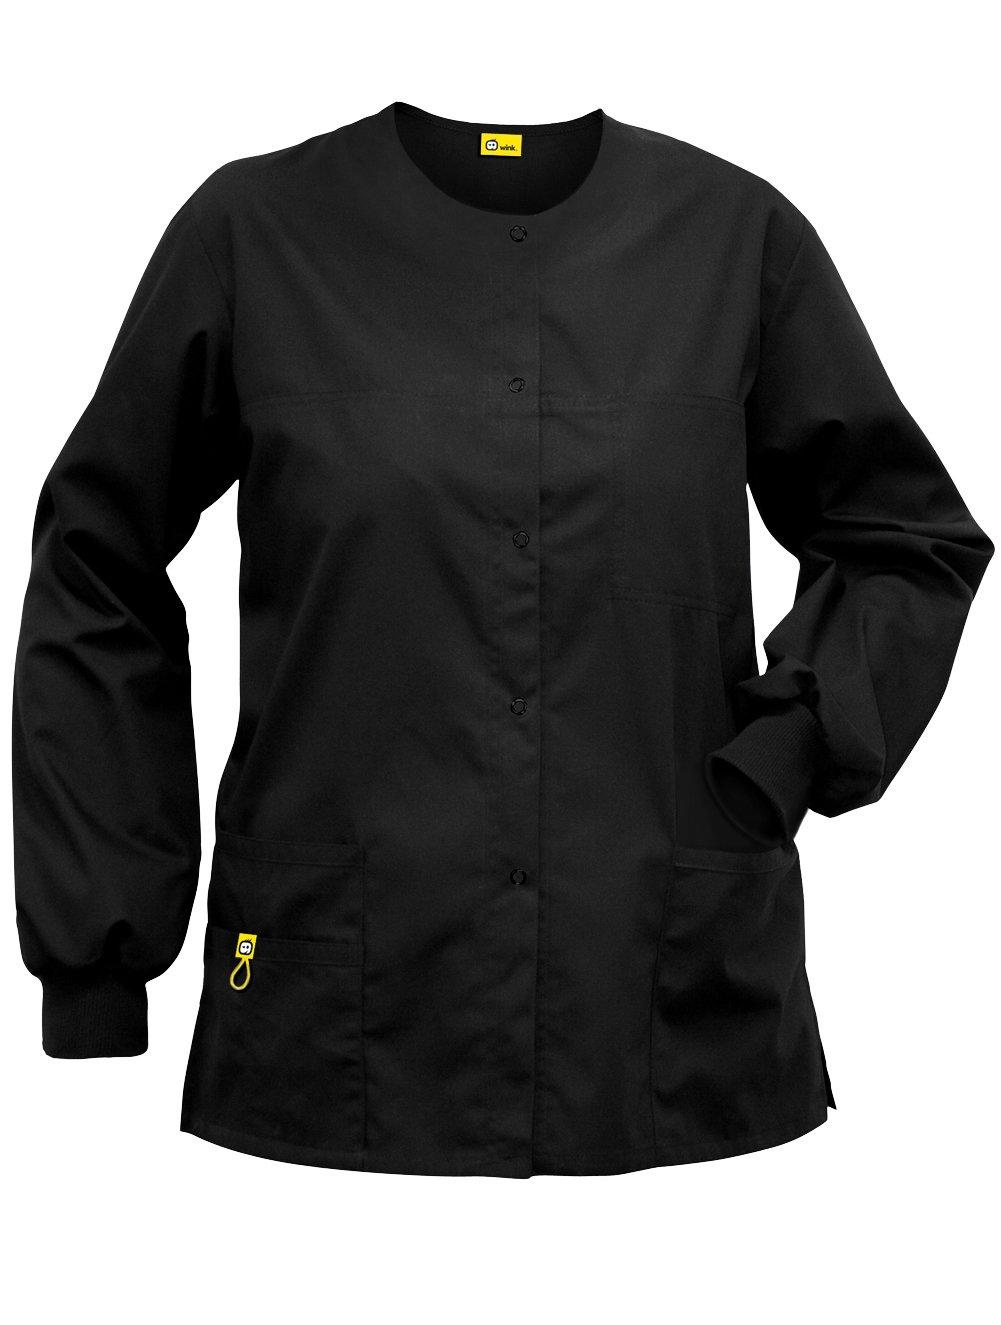 Wink 'The Delta' Scrub Jacket Black X-Large